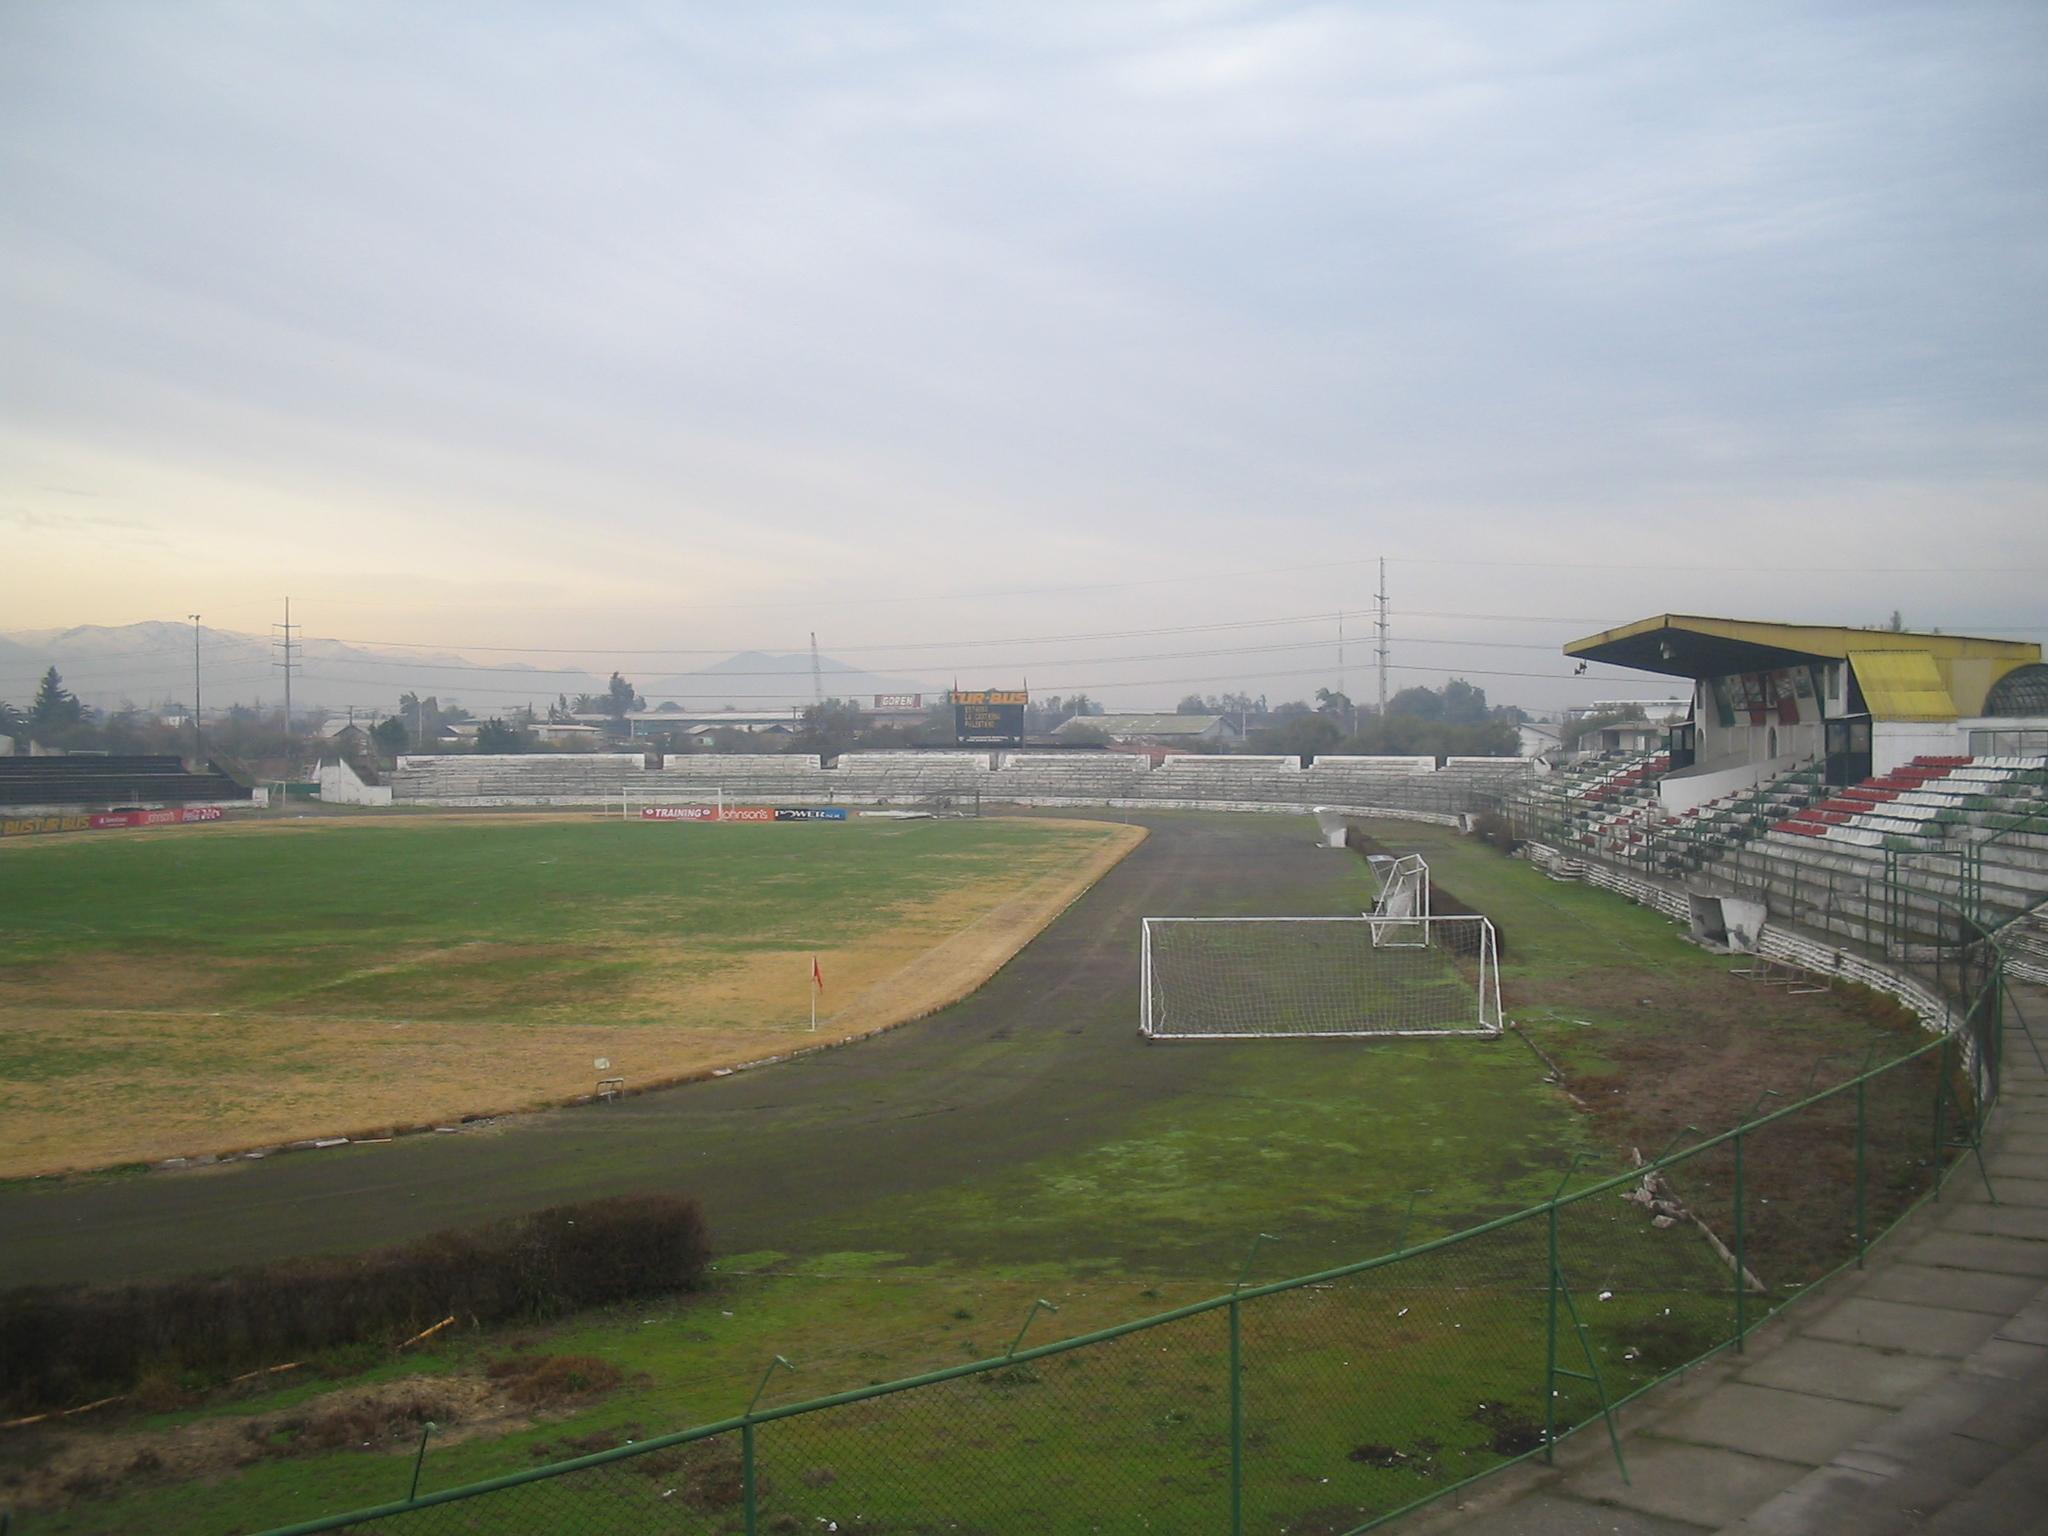 http://upload.wikimedia.org/wikipedia/commons/2/29/EstadioMunicipaldeLaCisterna.jpg